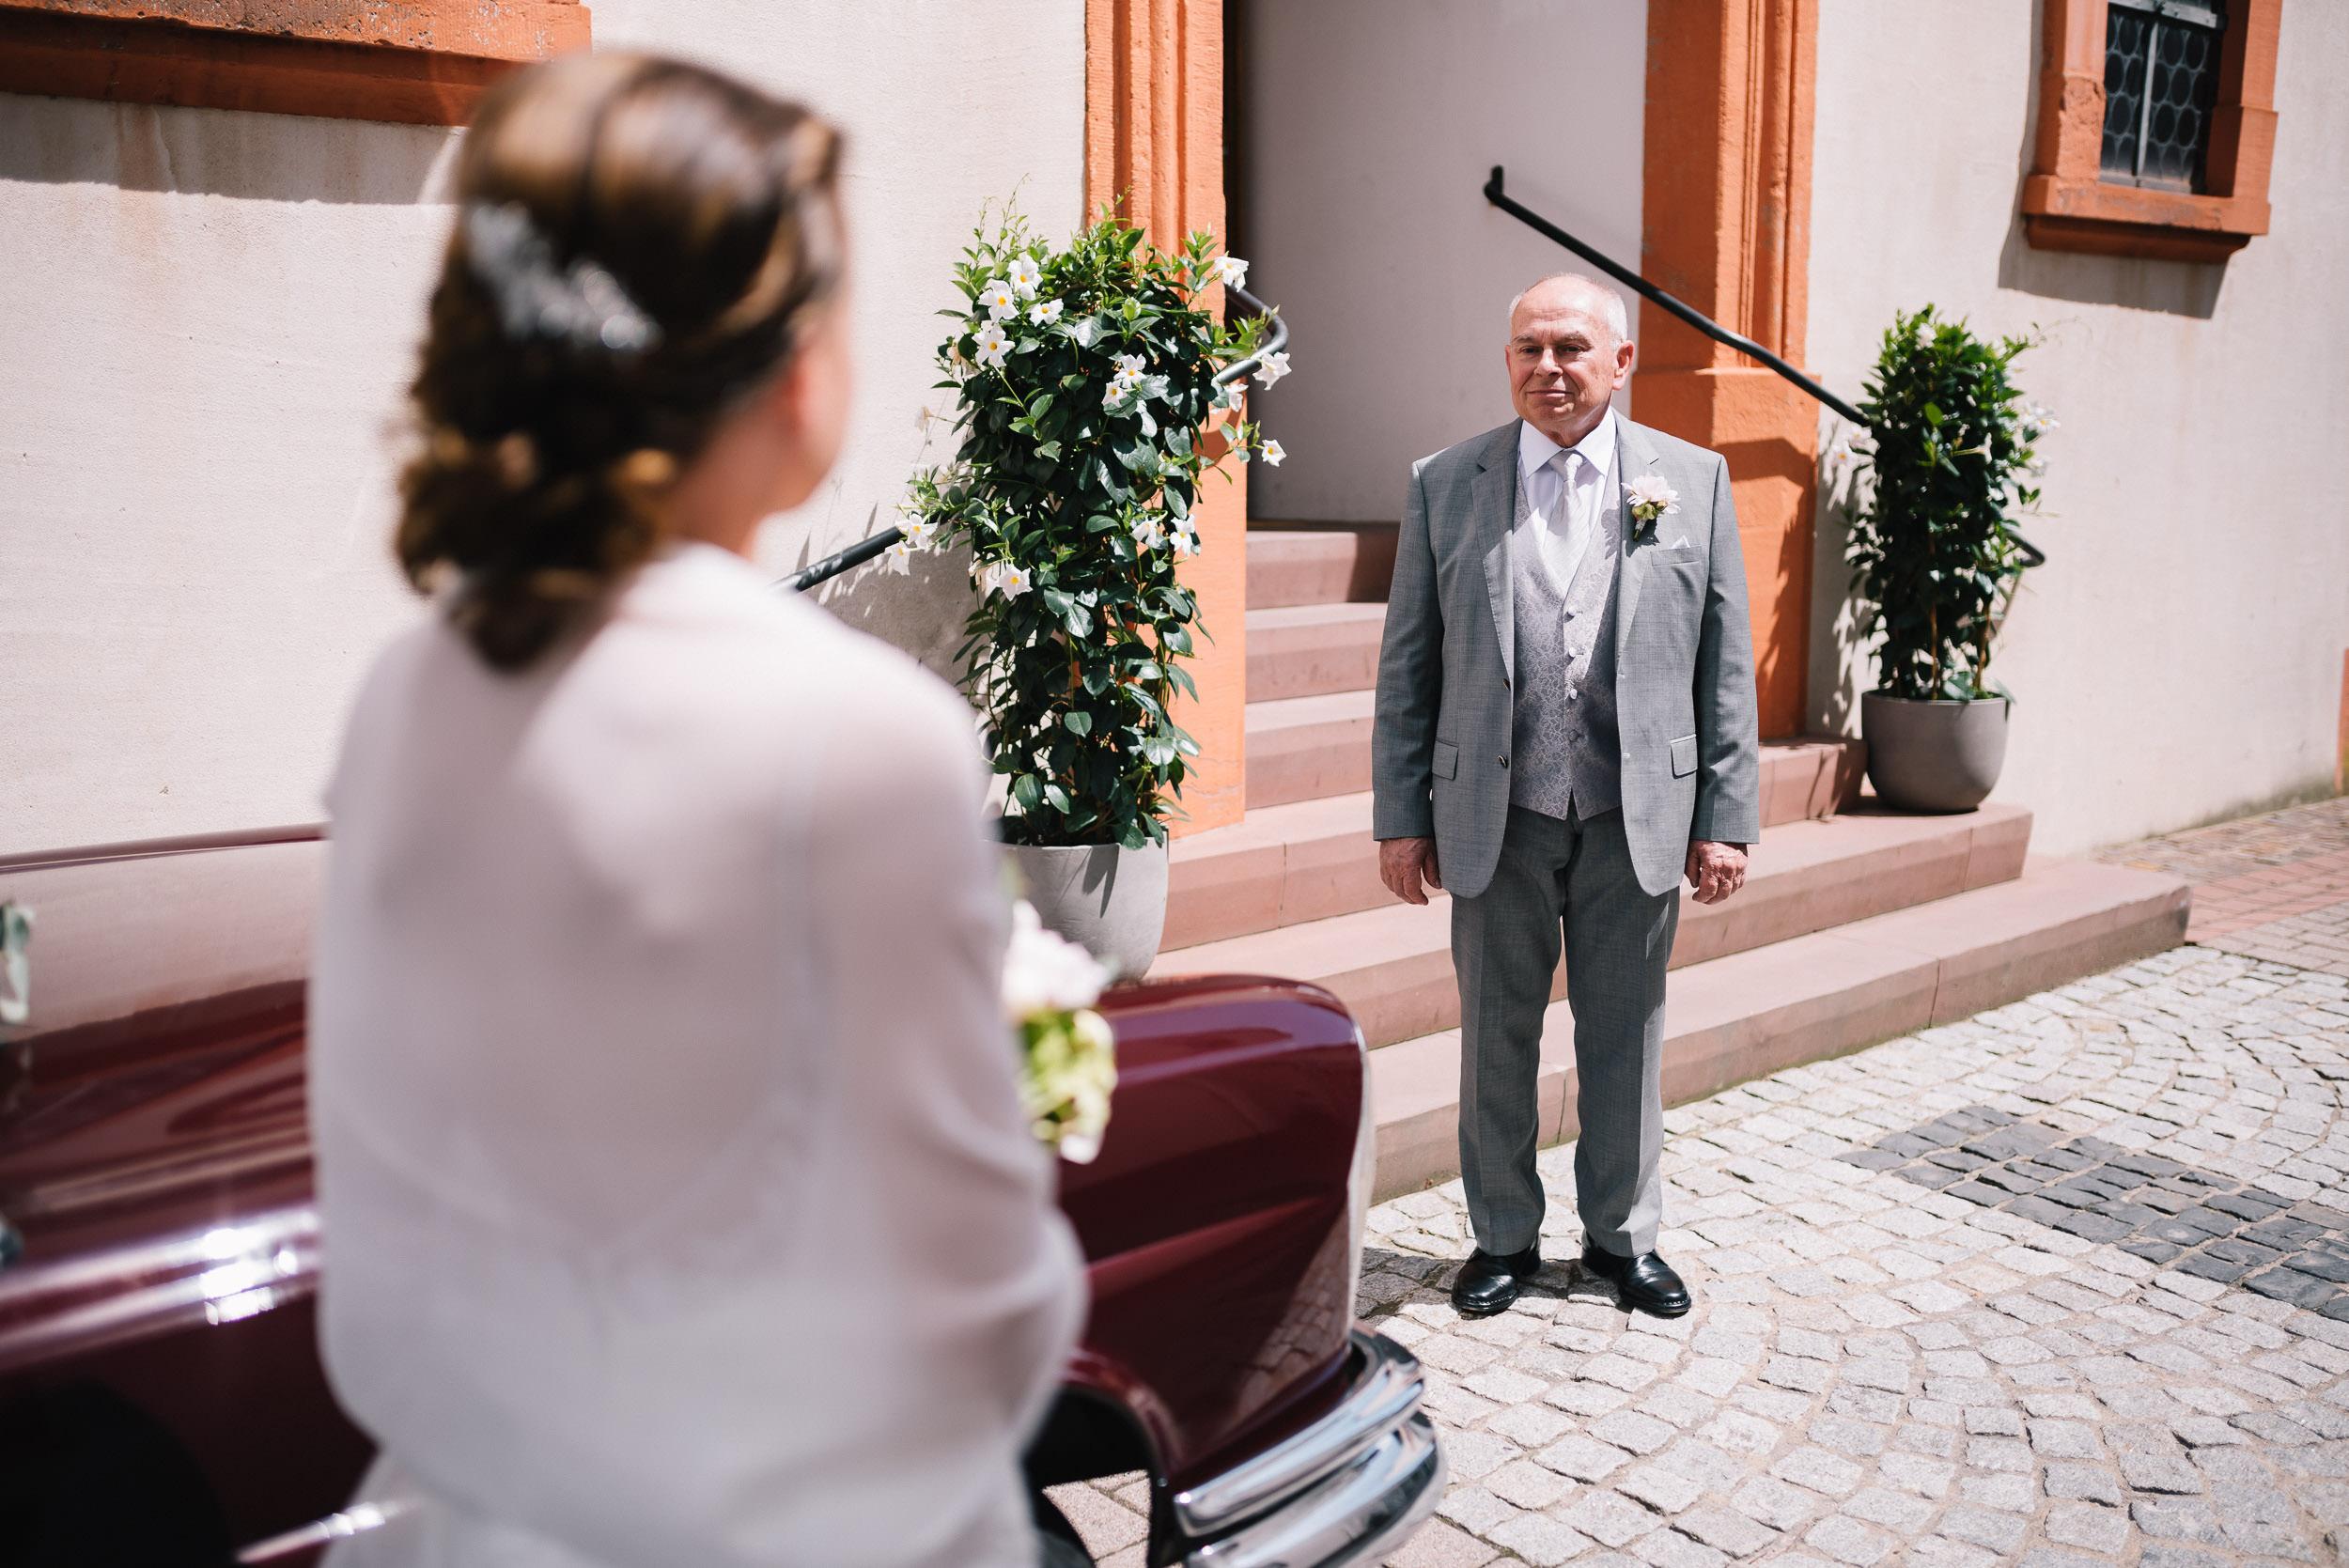 Hochzeit-Julia+Lars-Leimen+Bonsaizentrum-HD-020.jpg